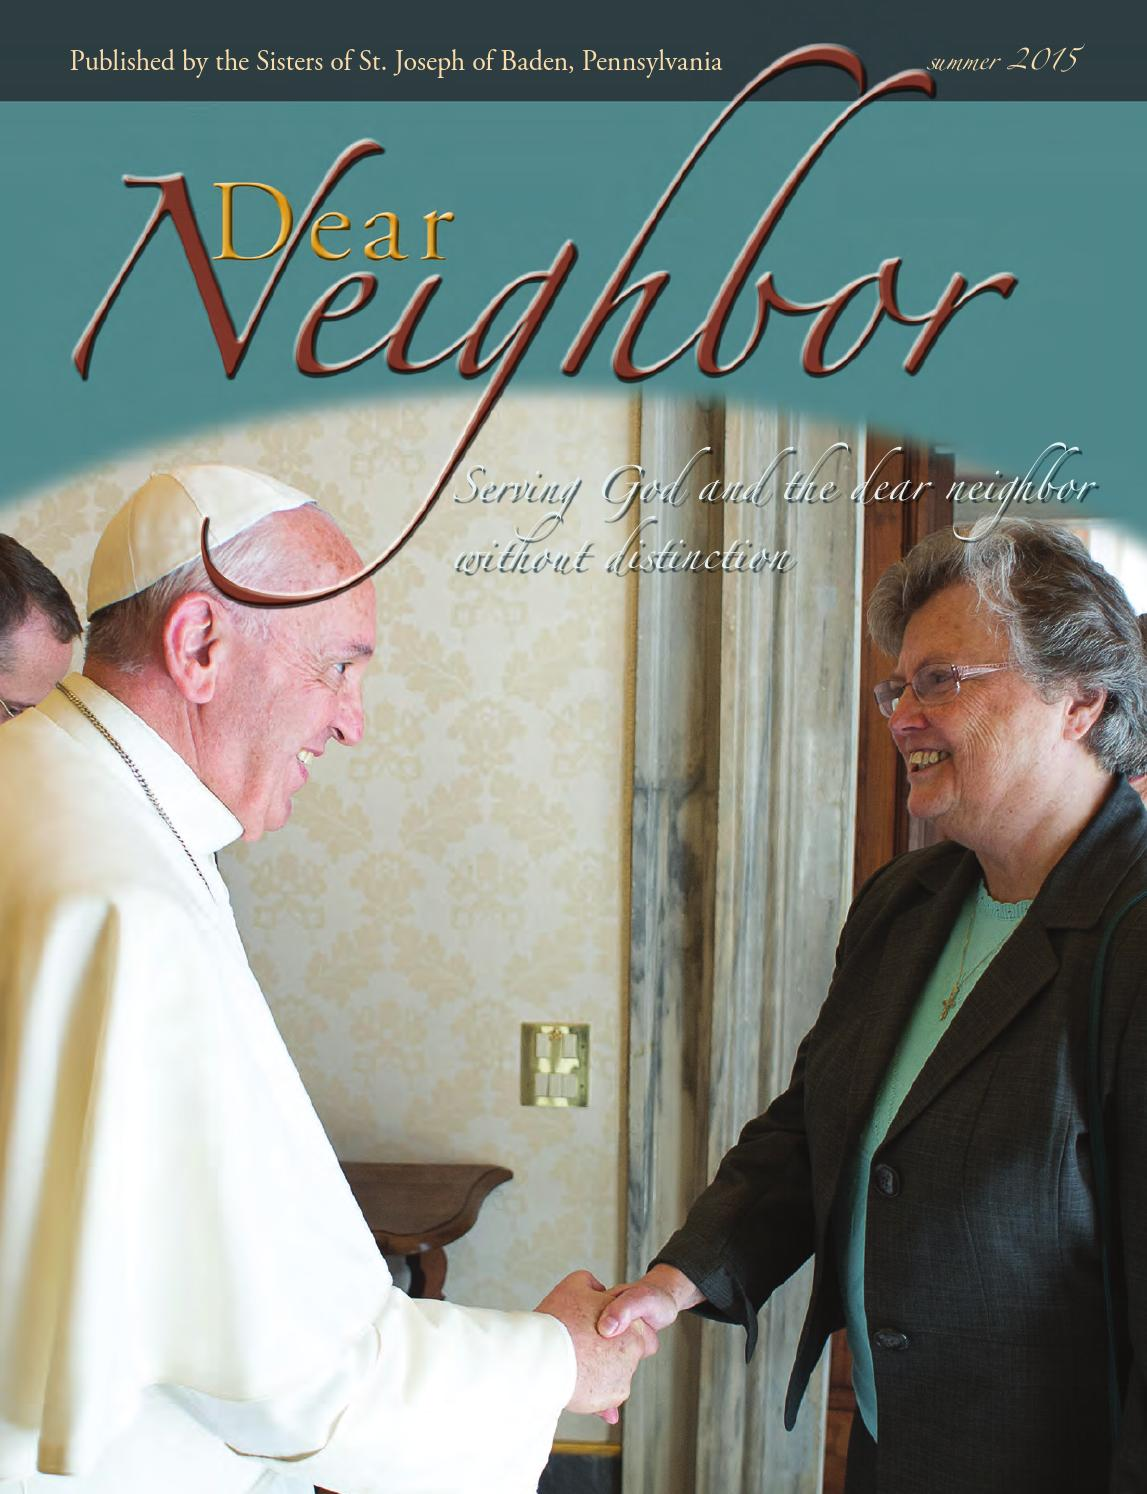 dear neighbor summer 2015 by sisters of st  joseph of